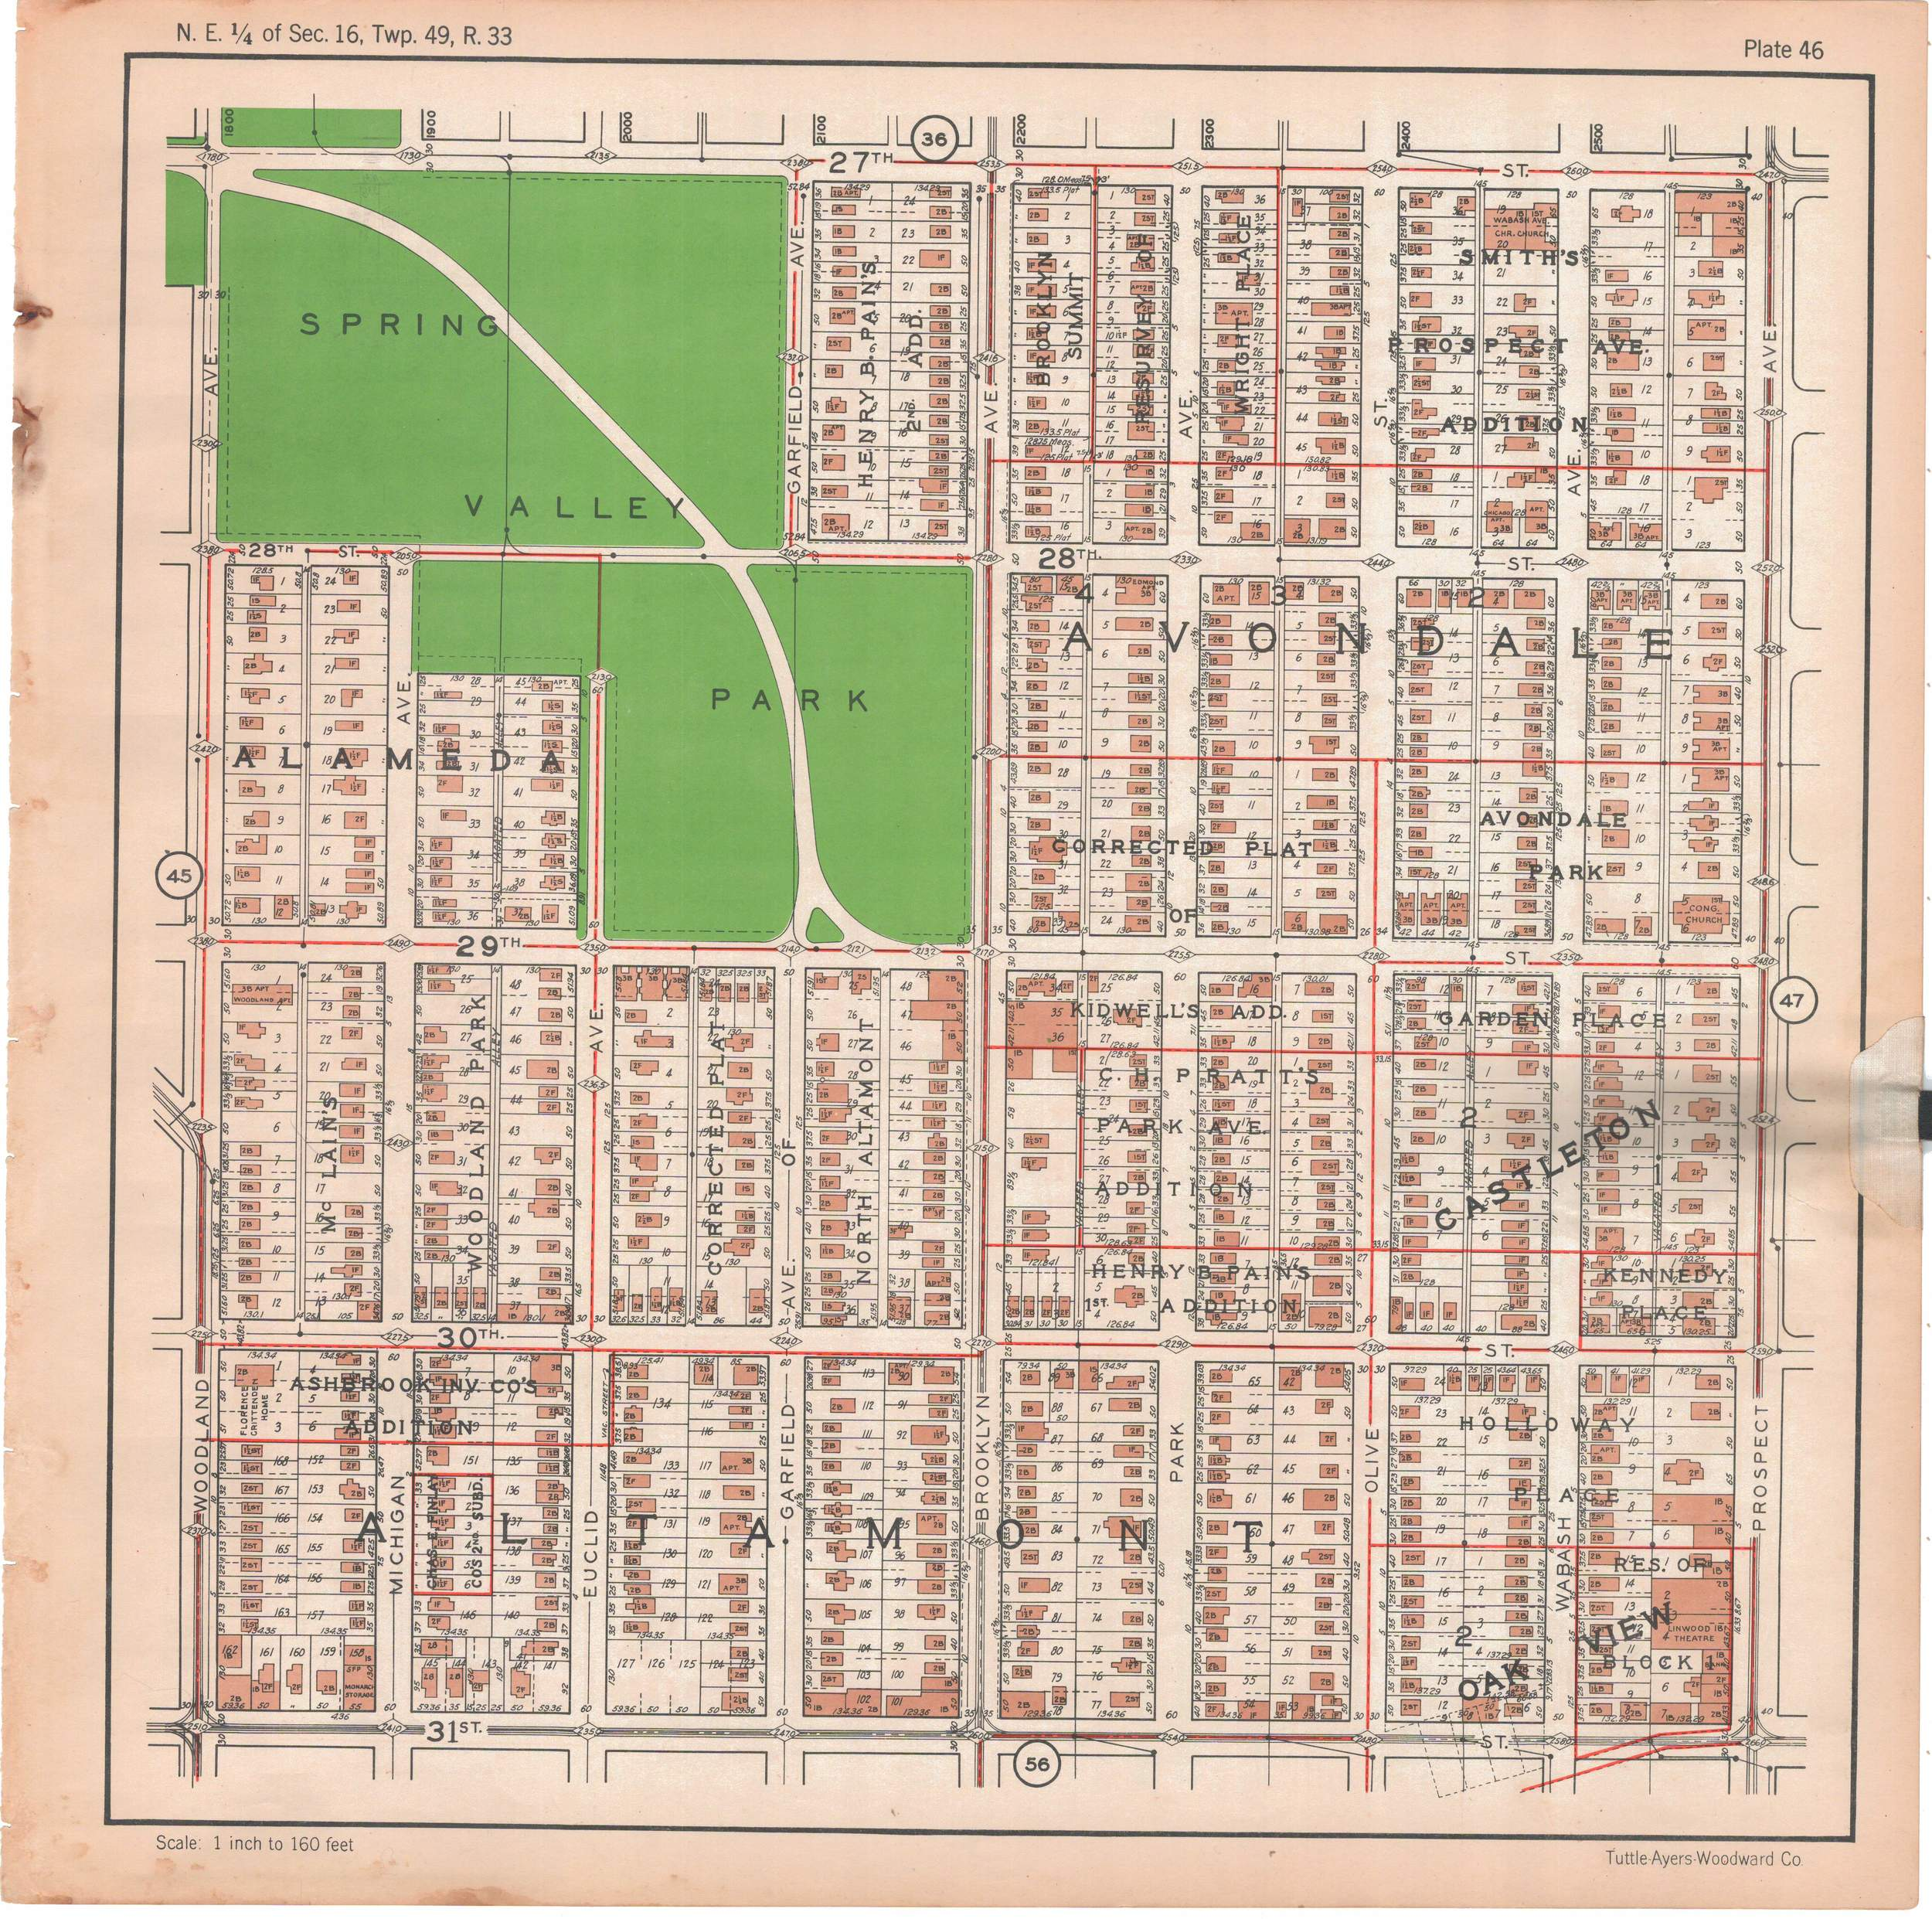 1925 TUTTLE_AYERS_Plate 46.JPG